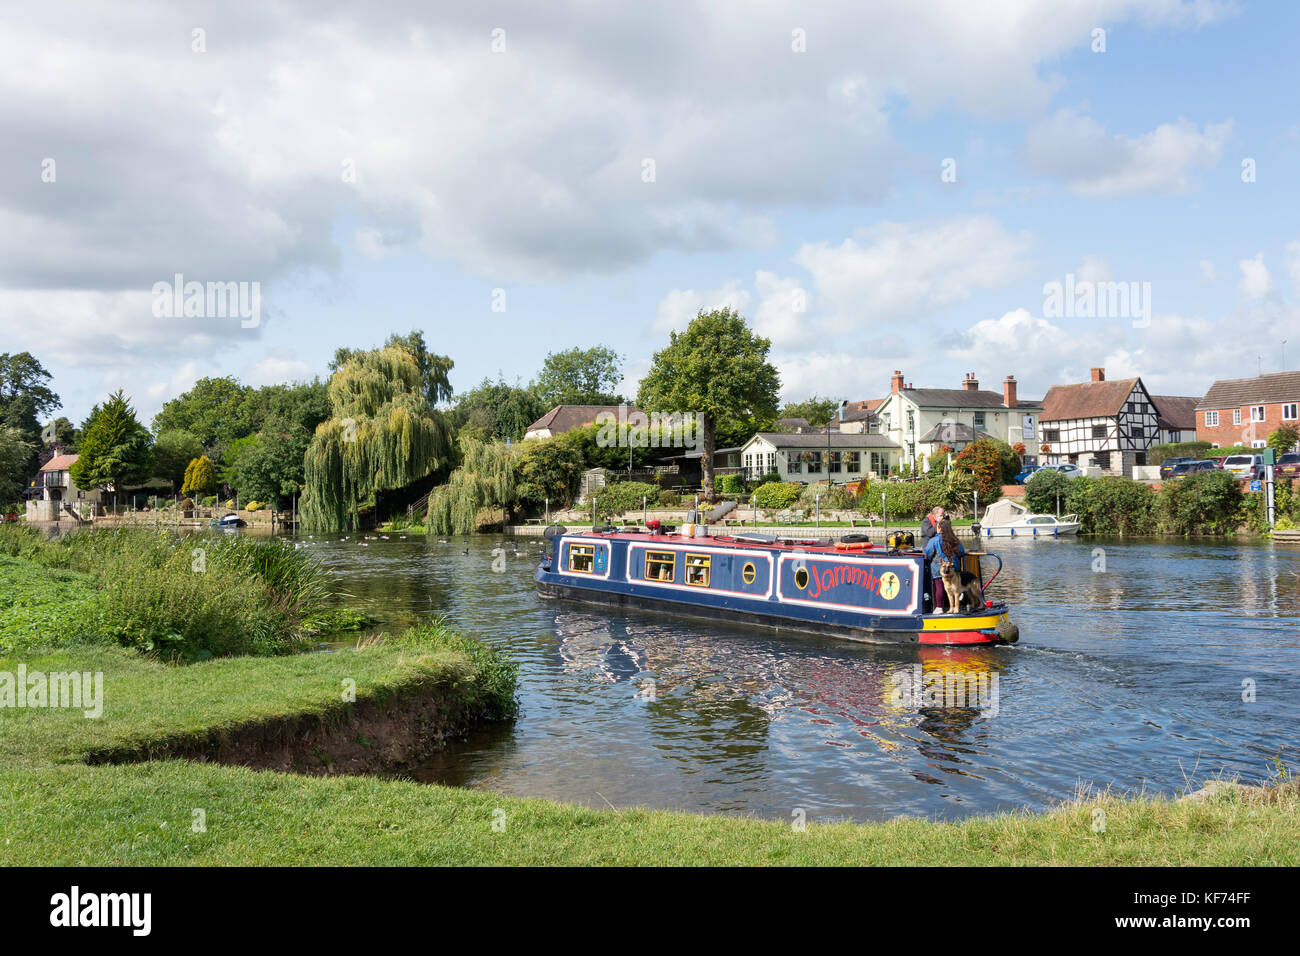 Canal boat on River Avon, The Big Meadow, Bidford-on-Avon, Warwickshire, England, United Kingdom Stock Photo